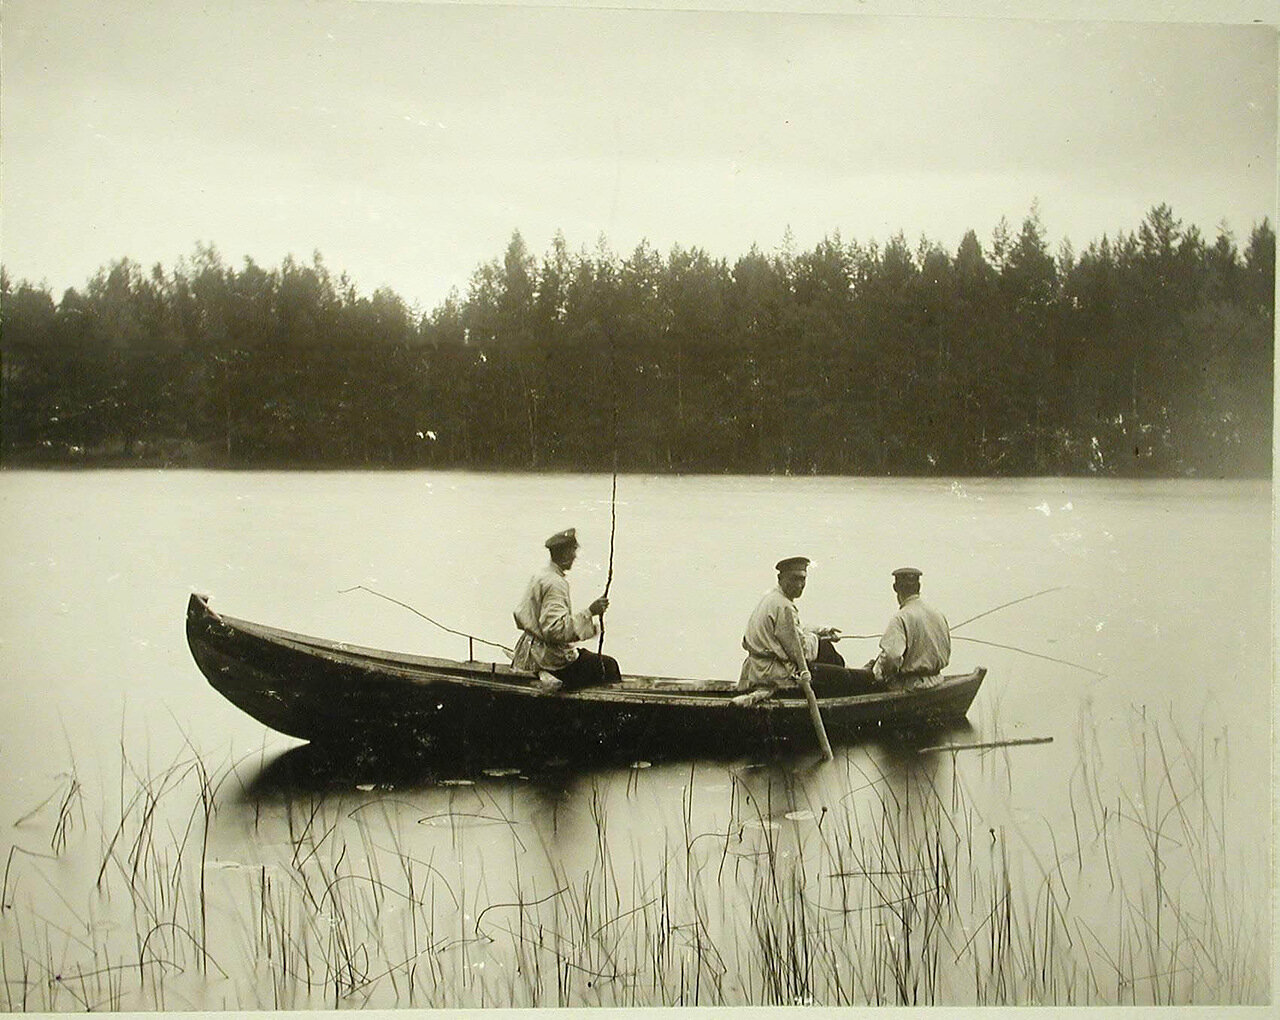 10. Рыболовы в лодке на озере Красавица